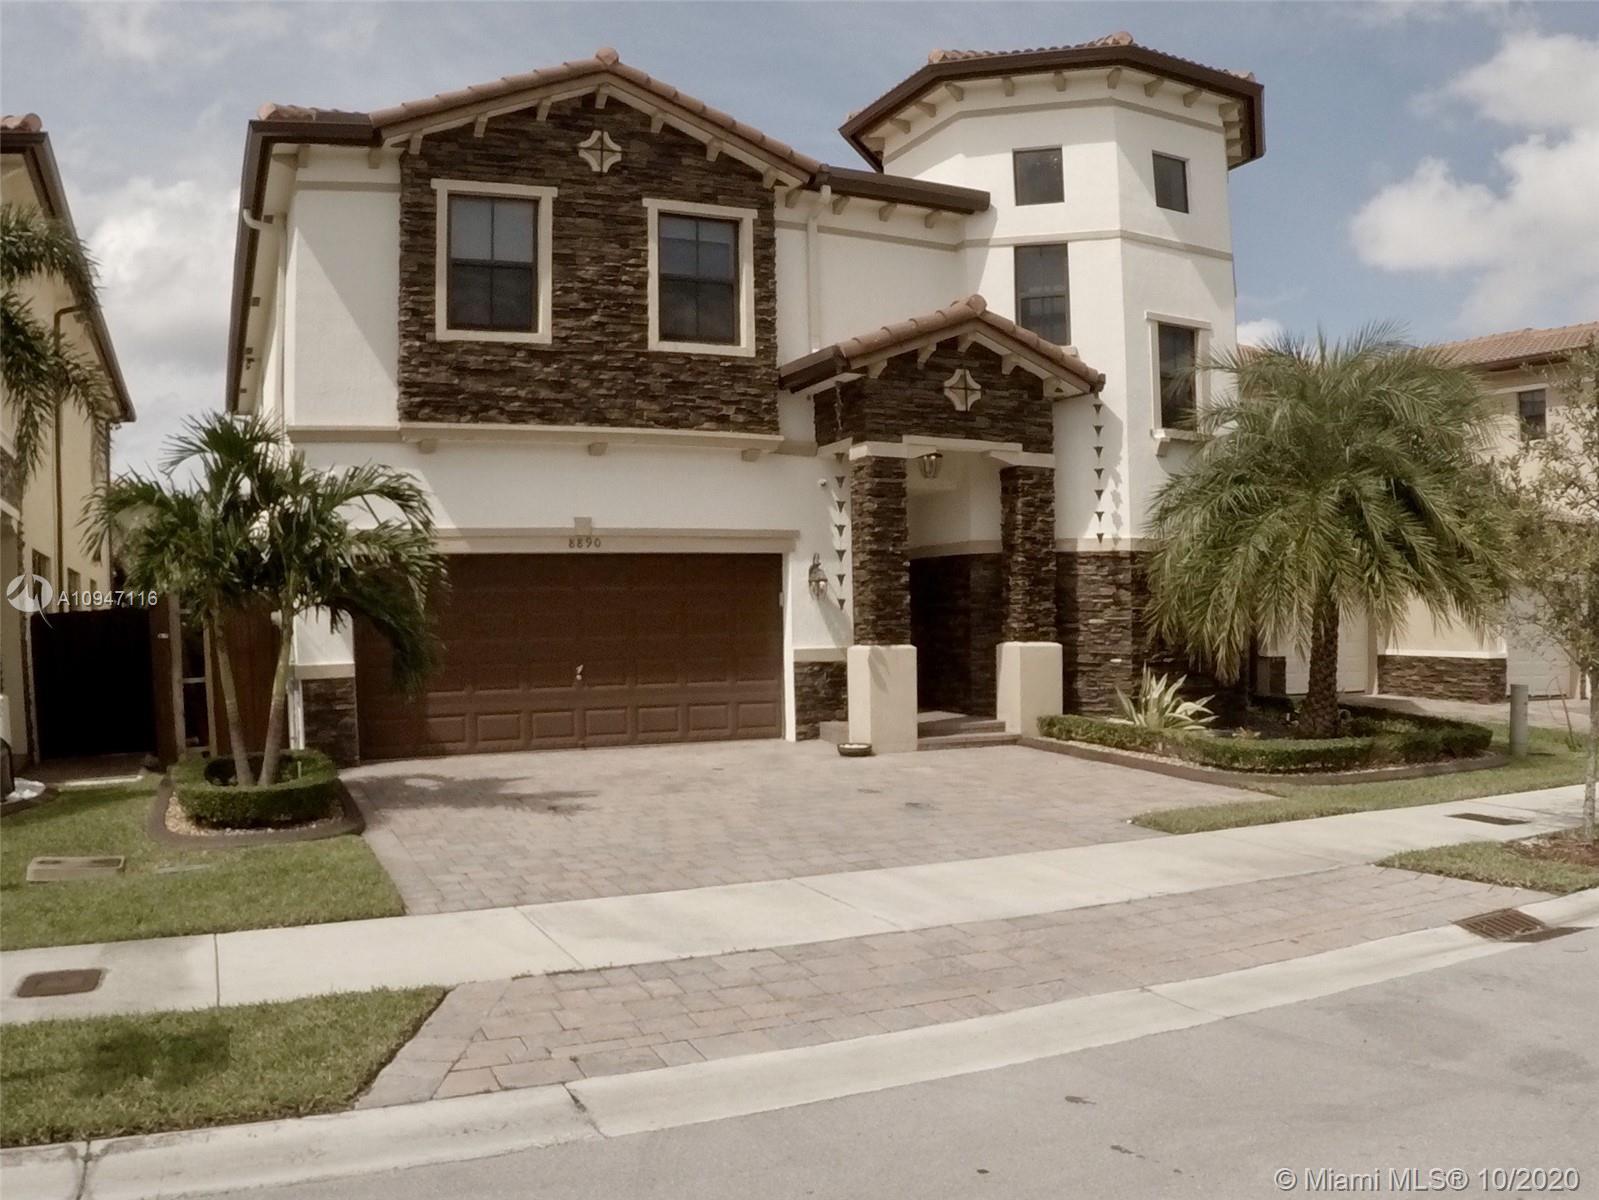 Grand Bay - 8890 NW 99th Ave, Doral, FL 33178